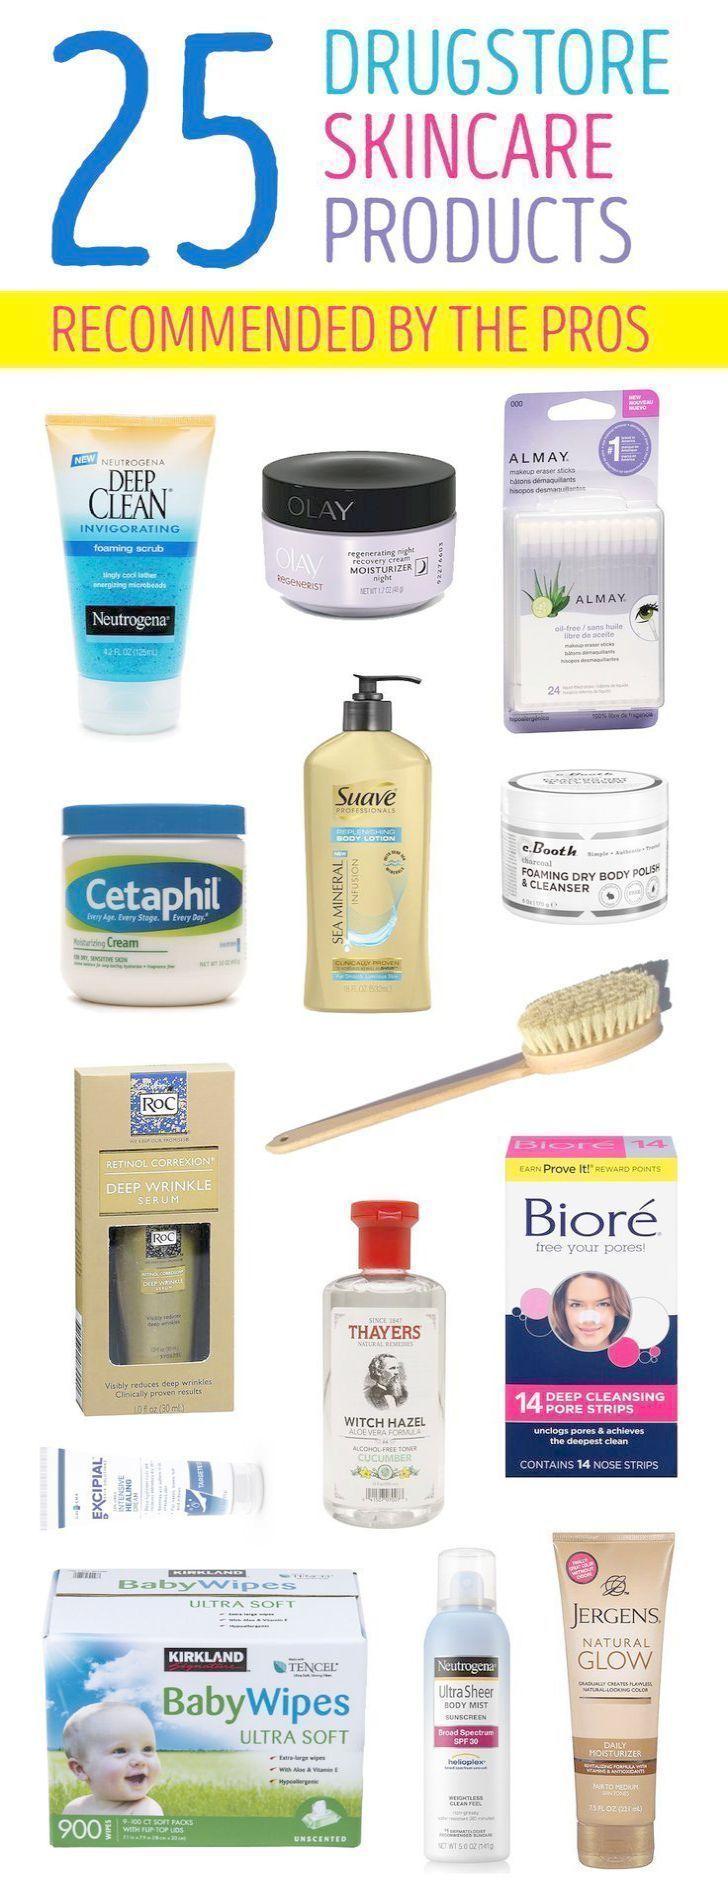 Skincare Routine Philippines Us Skin Care Products For Skin Care P Care Philippines Products Routine Skin In 2020 Celebrity Skin Care Drugstore Skincare Skin Care